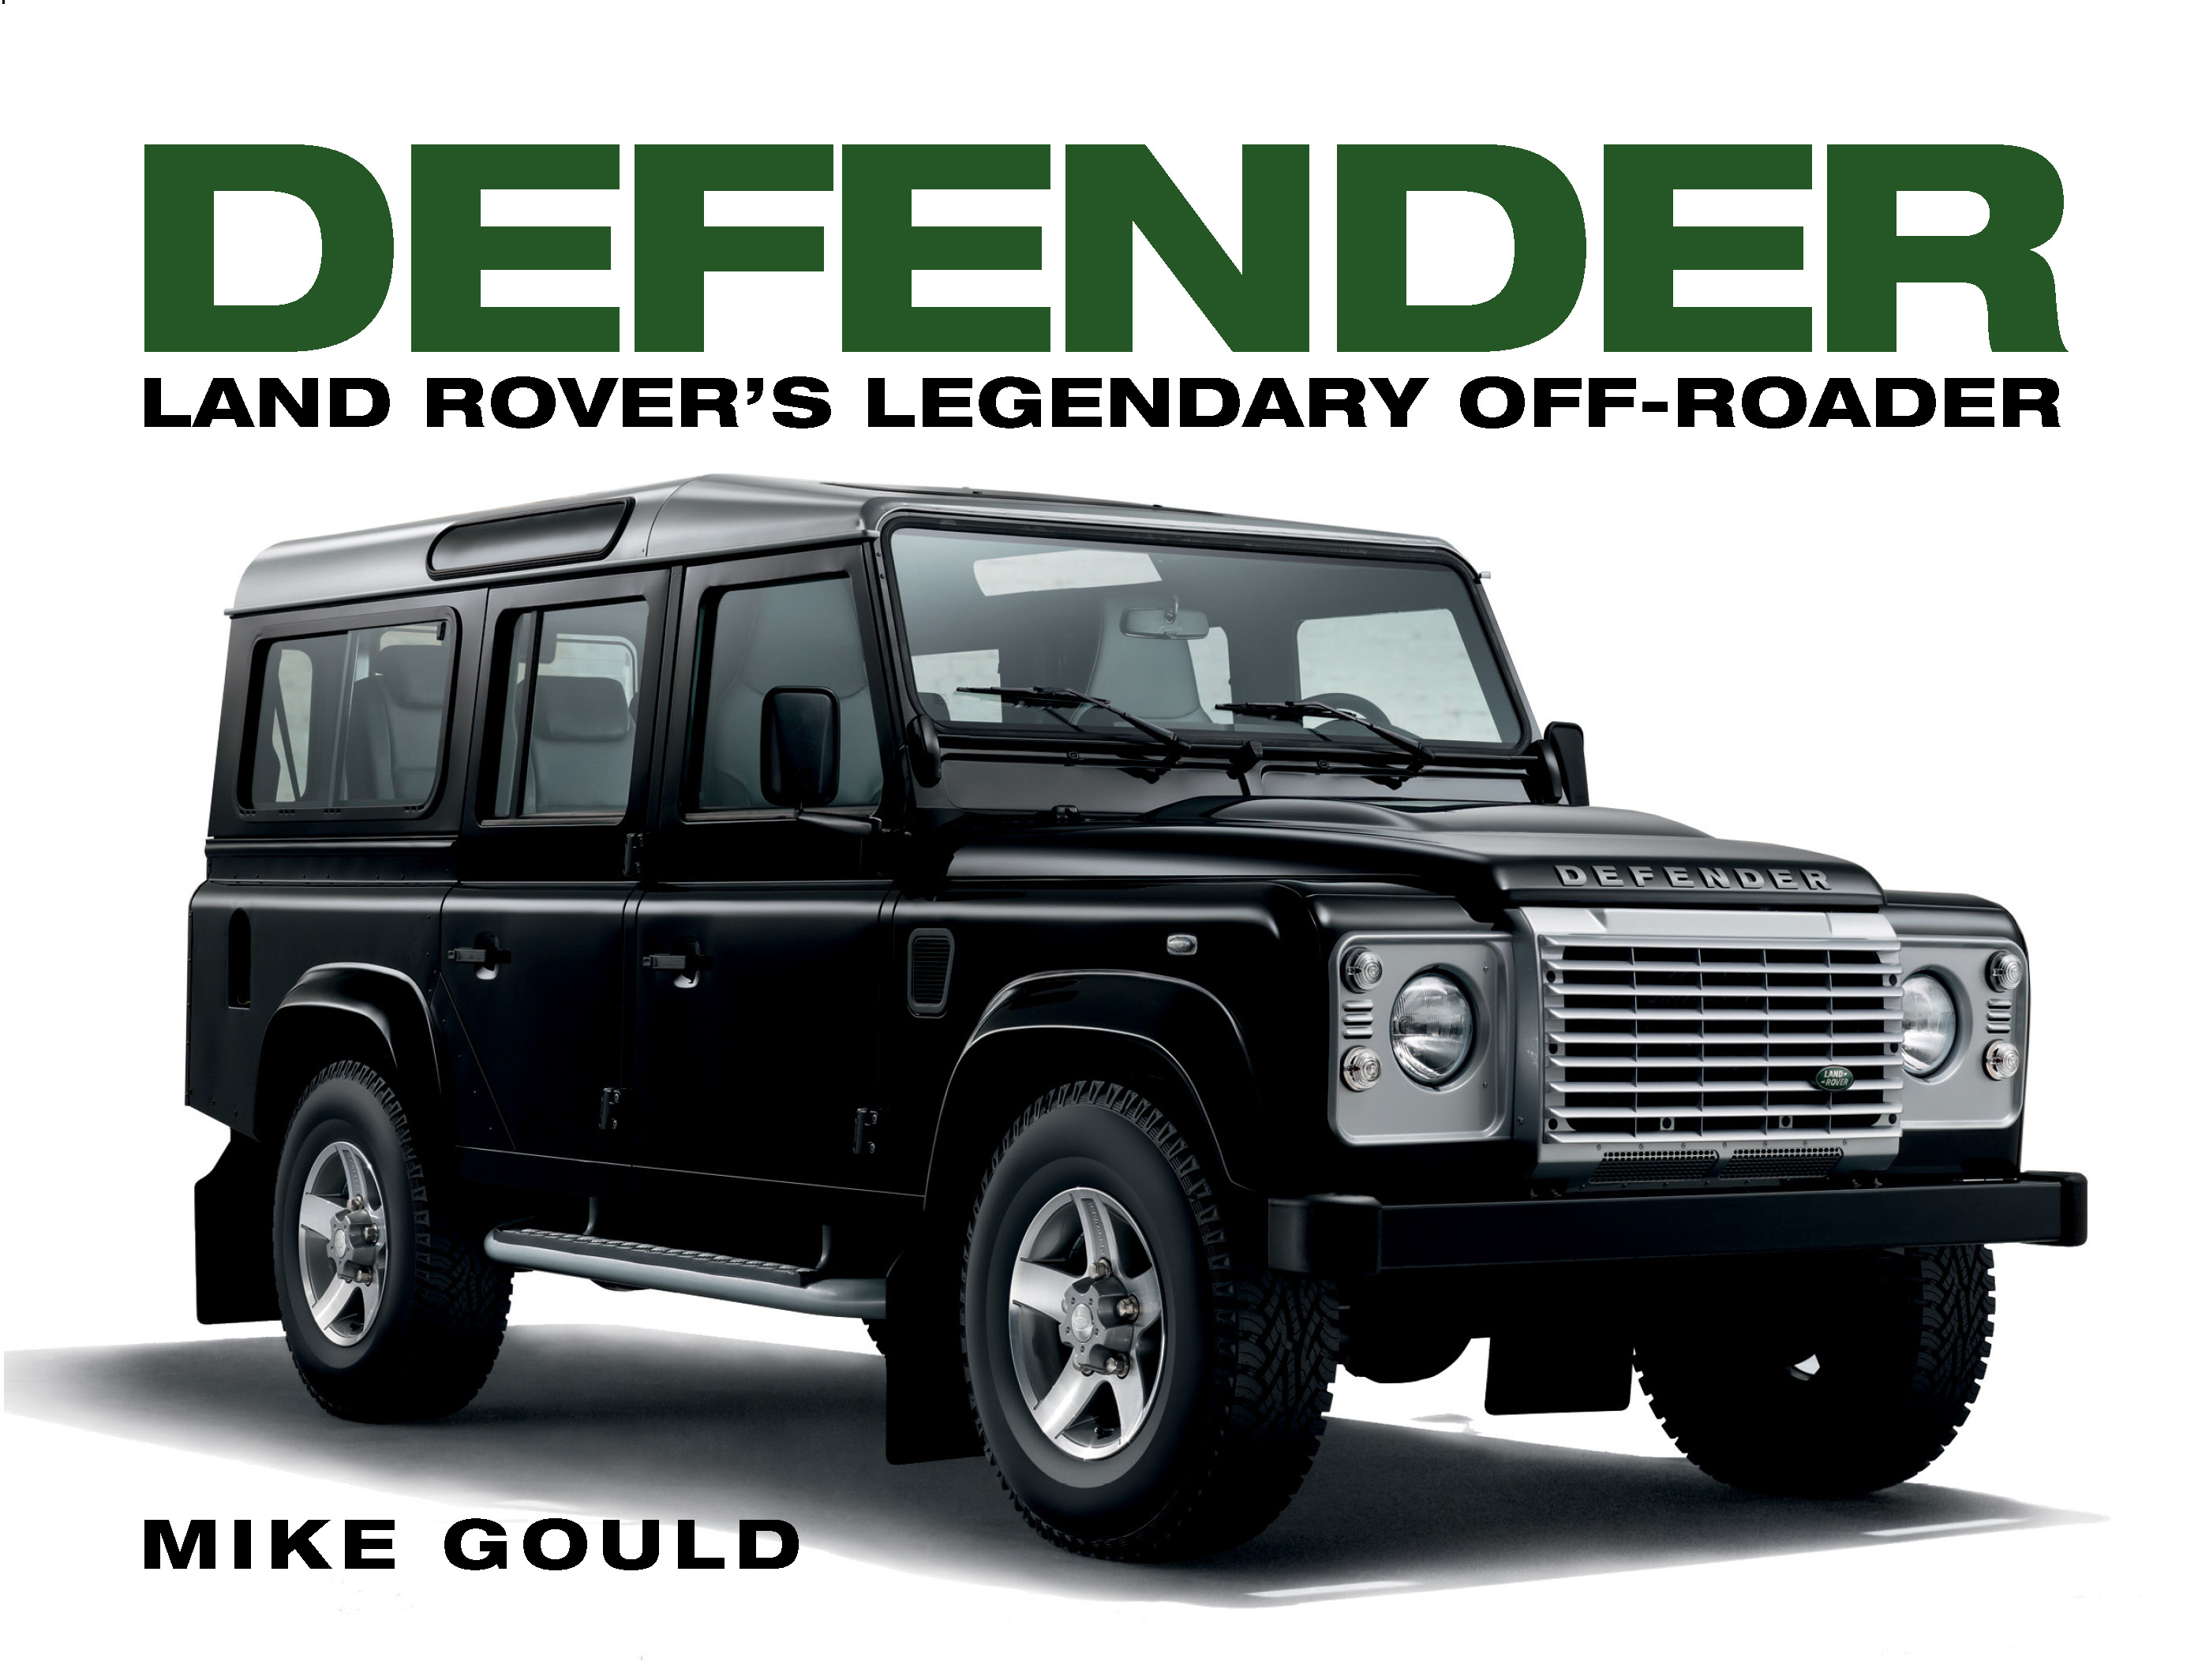 landrover service executive sales rover ottawa sale specials for loaner land demo demos